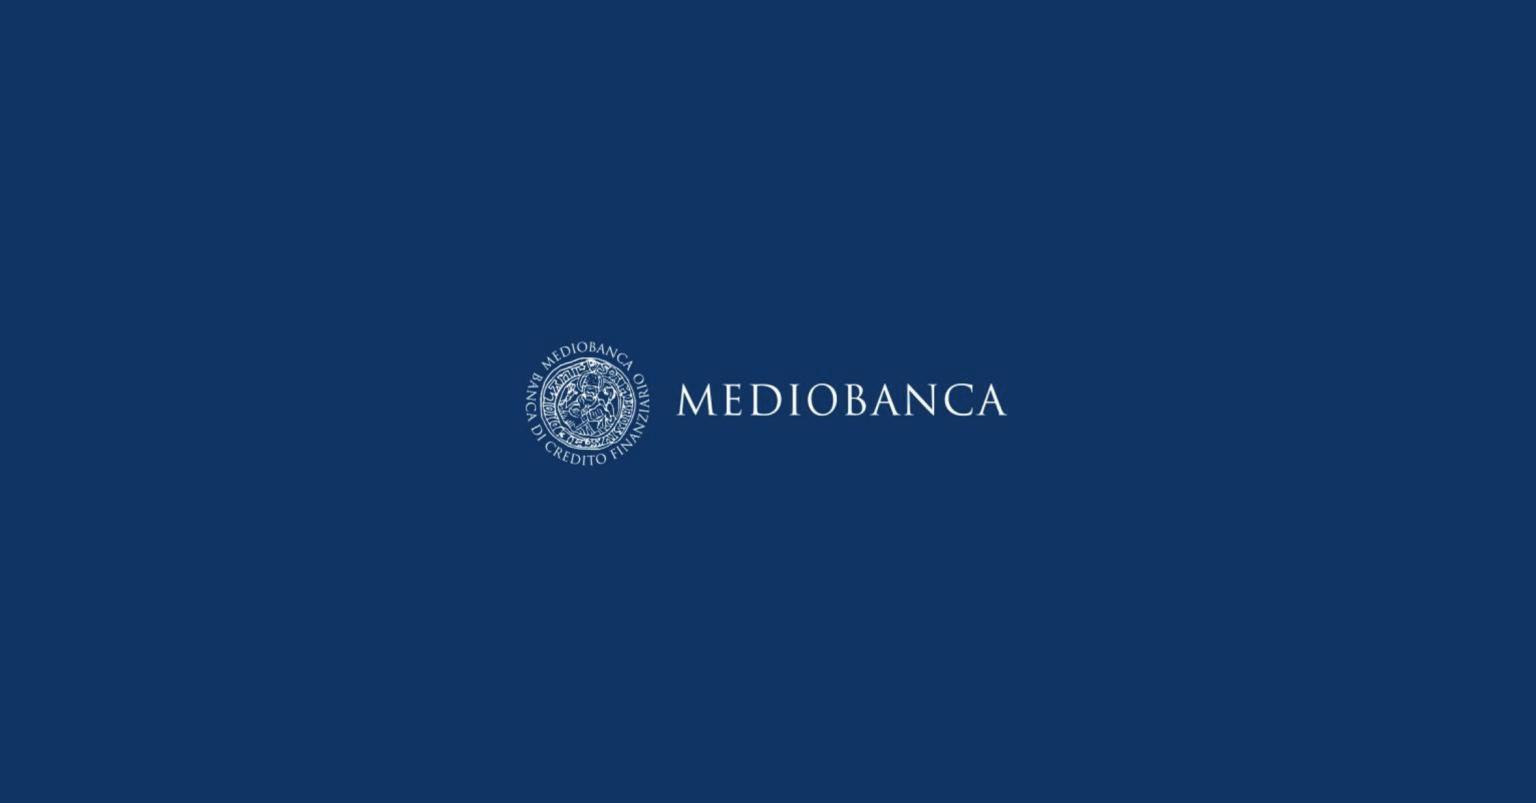 Mediobanca,這就是Assogestioni嚴重癱瘓的原因(風信子喜歡)